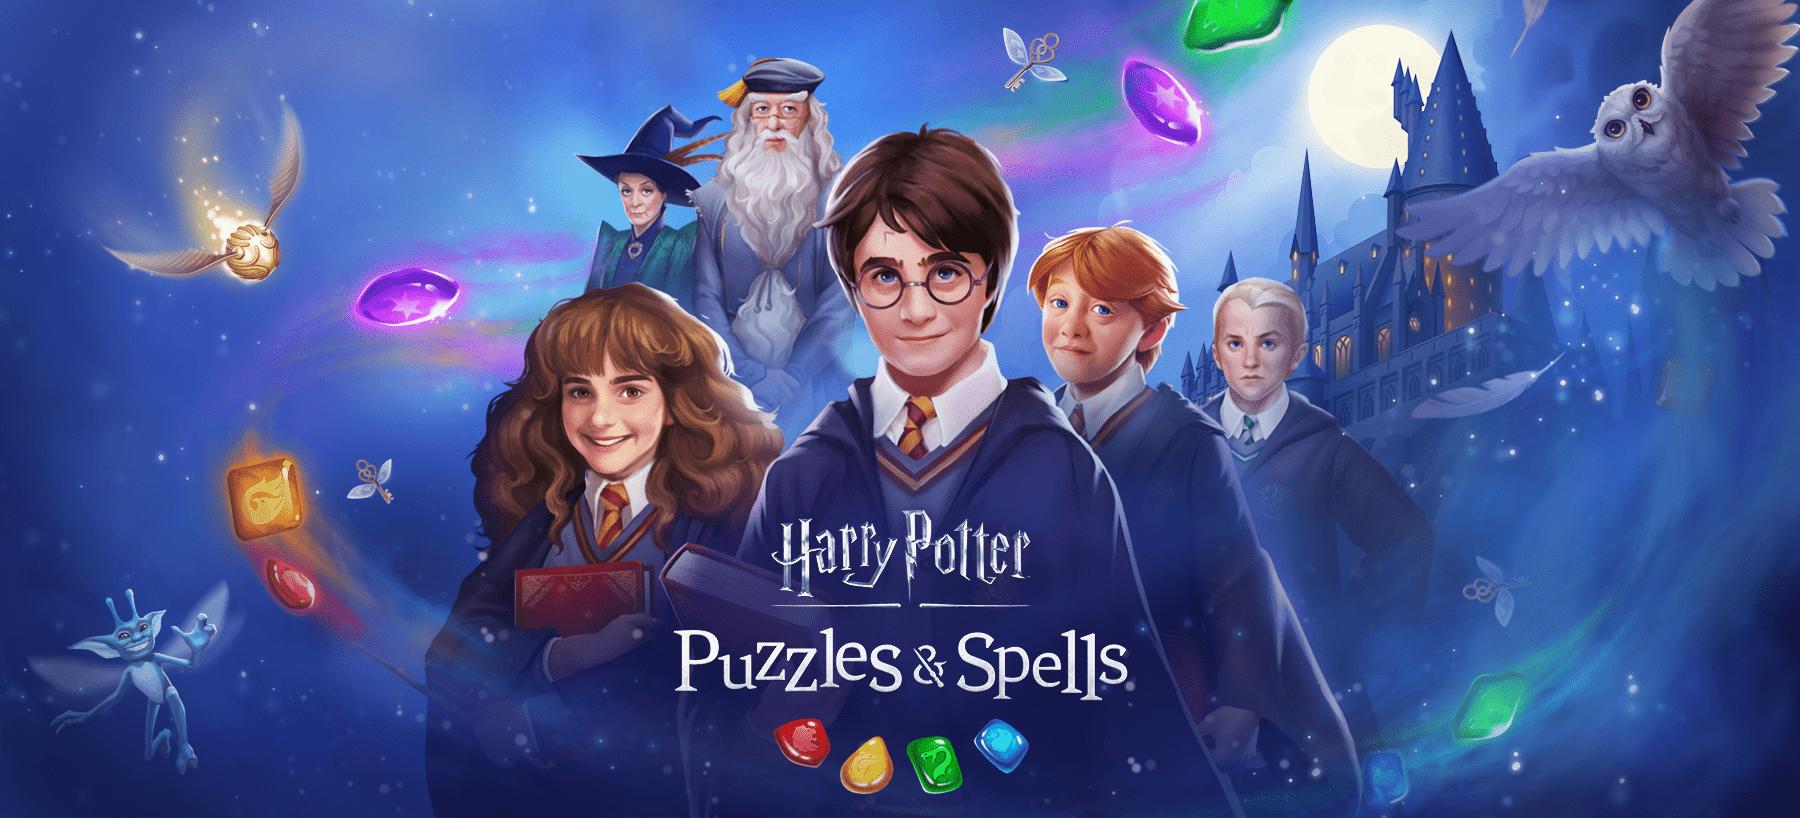 Harry Potter: Puzzles & Spells Hero Image